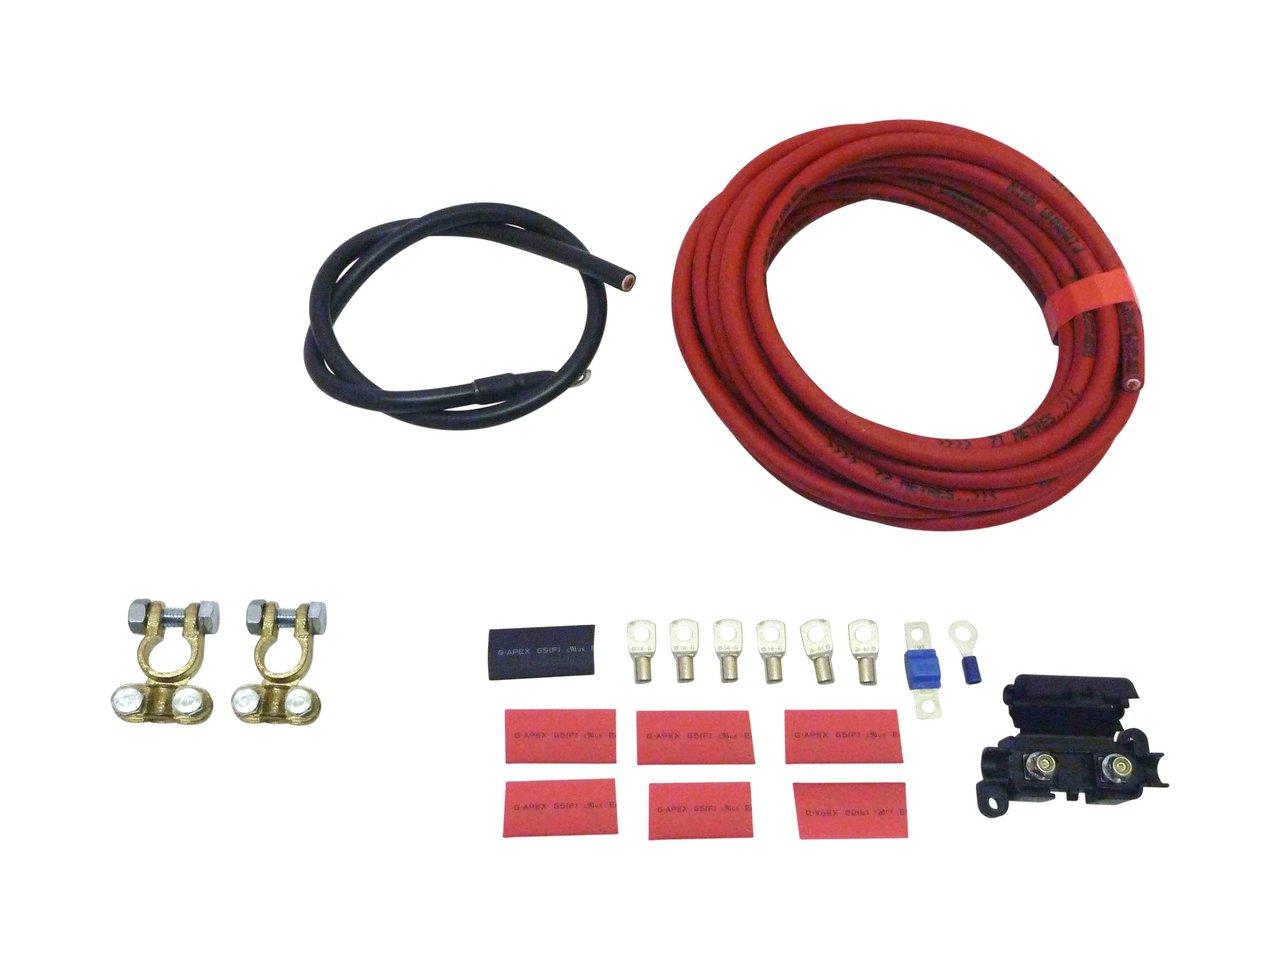 Dual Battery Wiring Kit Piranha Fuel Pump